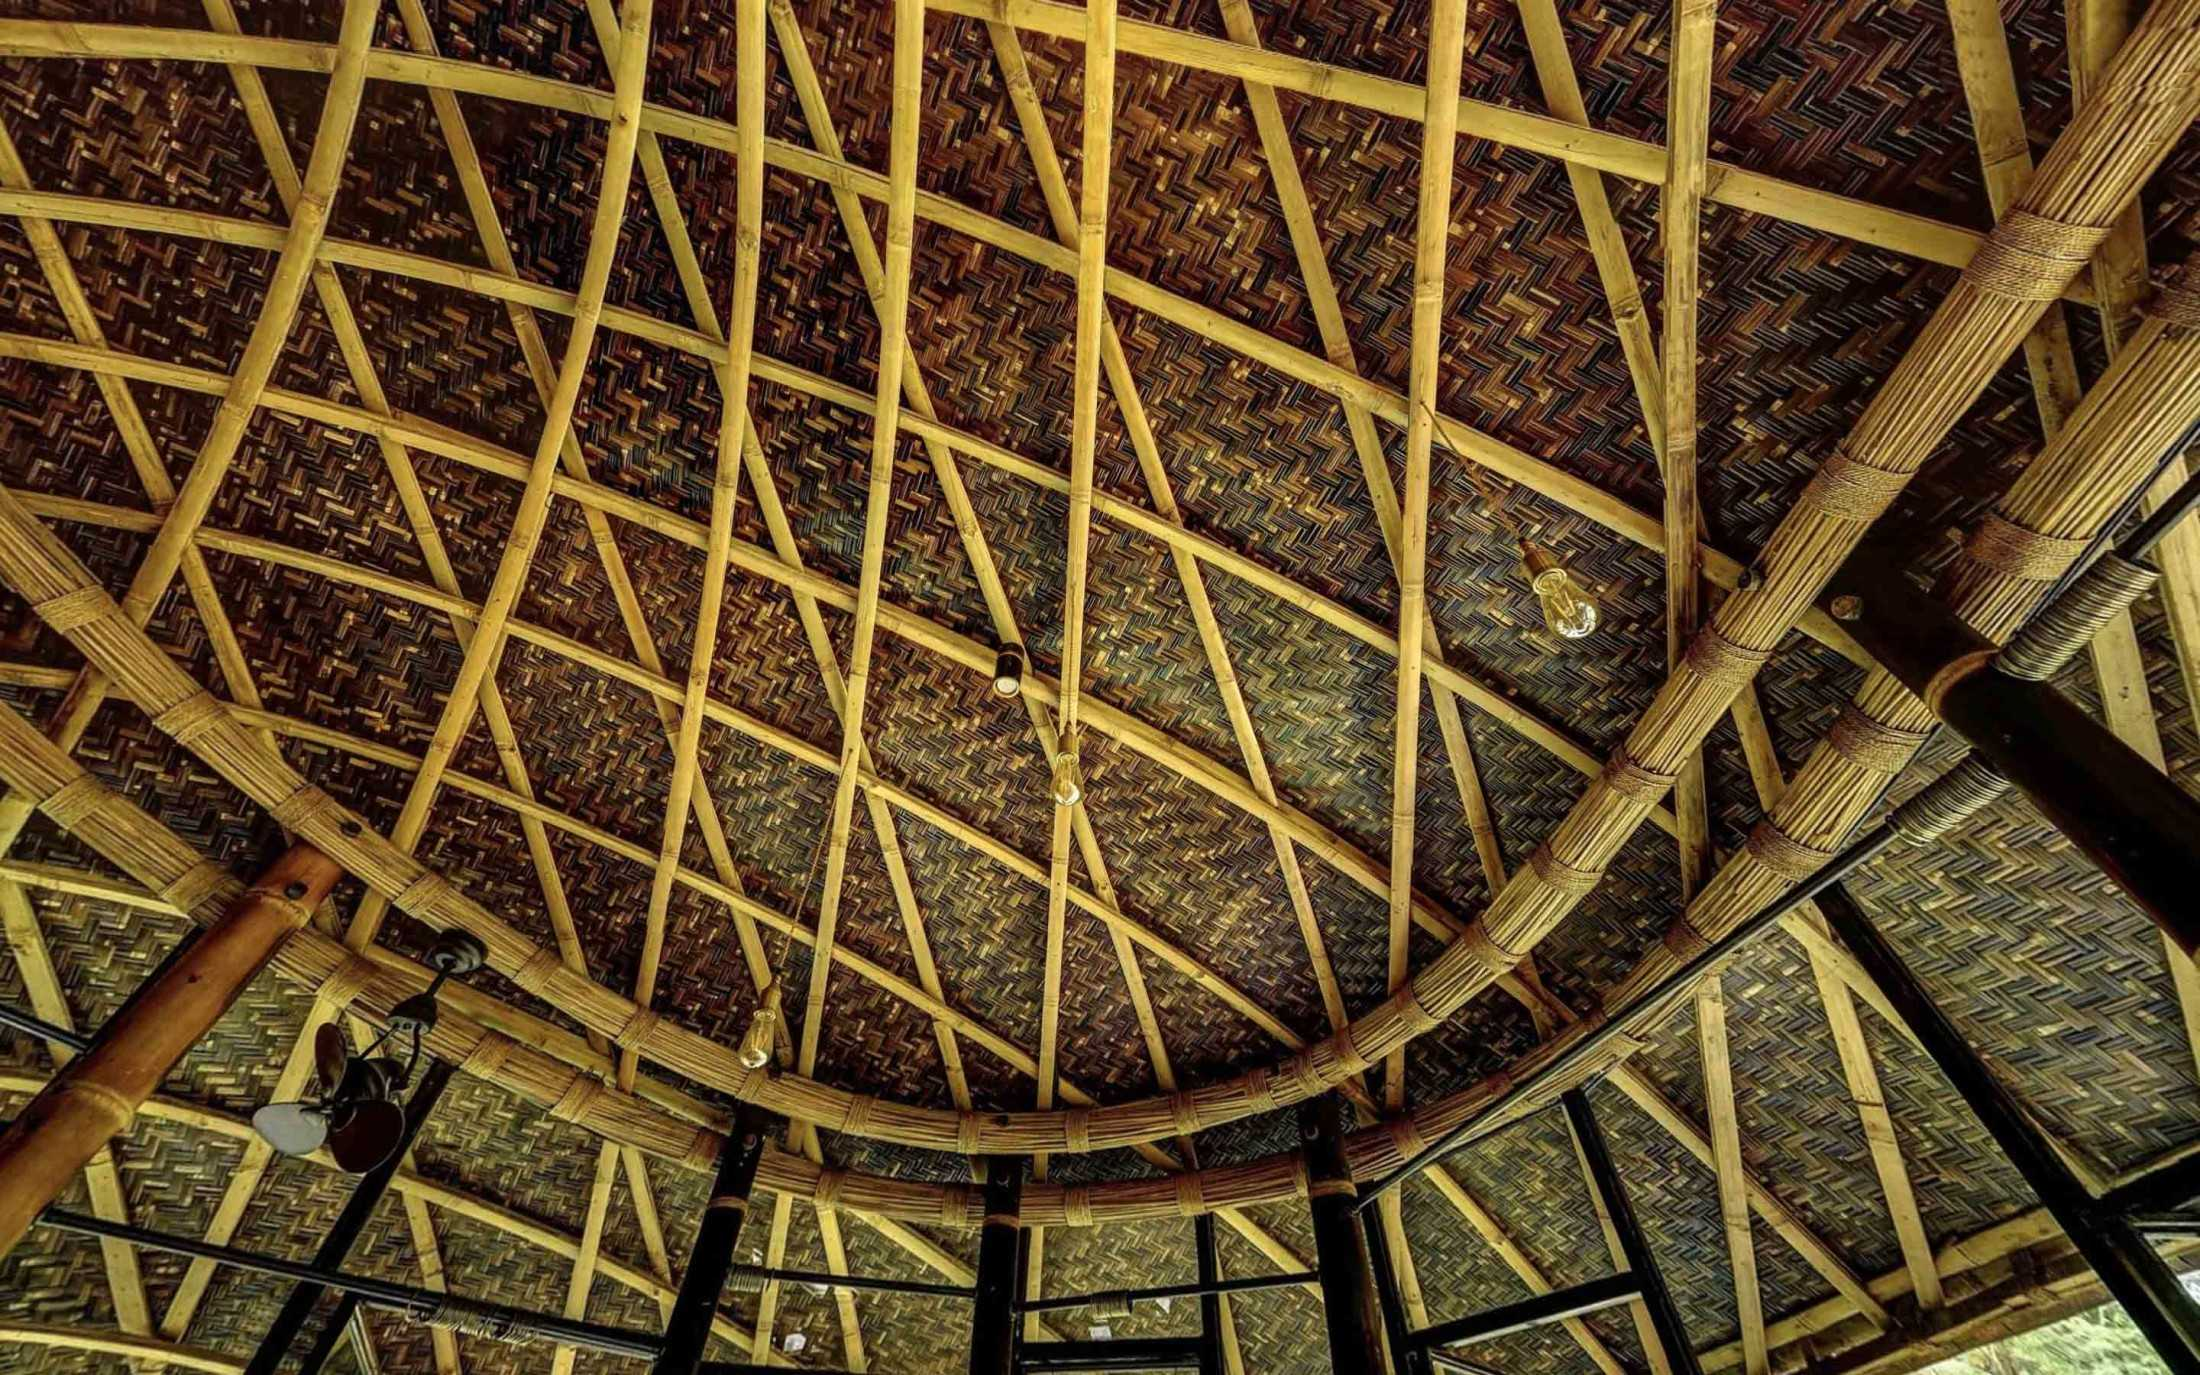 Agung Budi Raharsa | Architecture & Engineering Riverbend Bamboo House - Bali Bali, Indonesia Bali, Indonesia Agung-Budi-Raharsa-Riverbend-House-Bali  88720